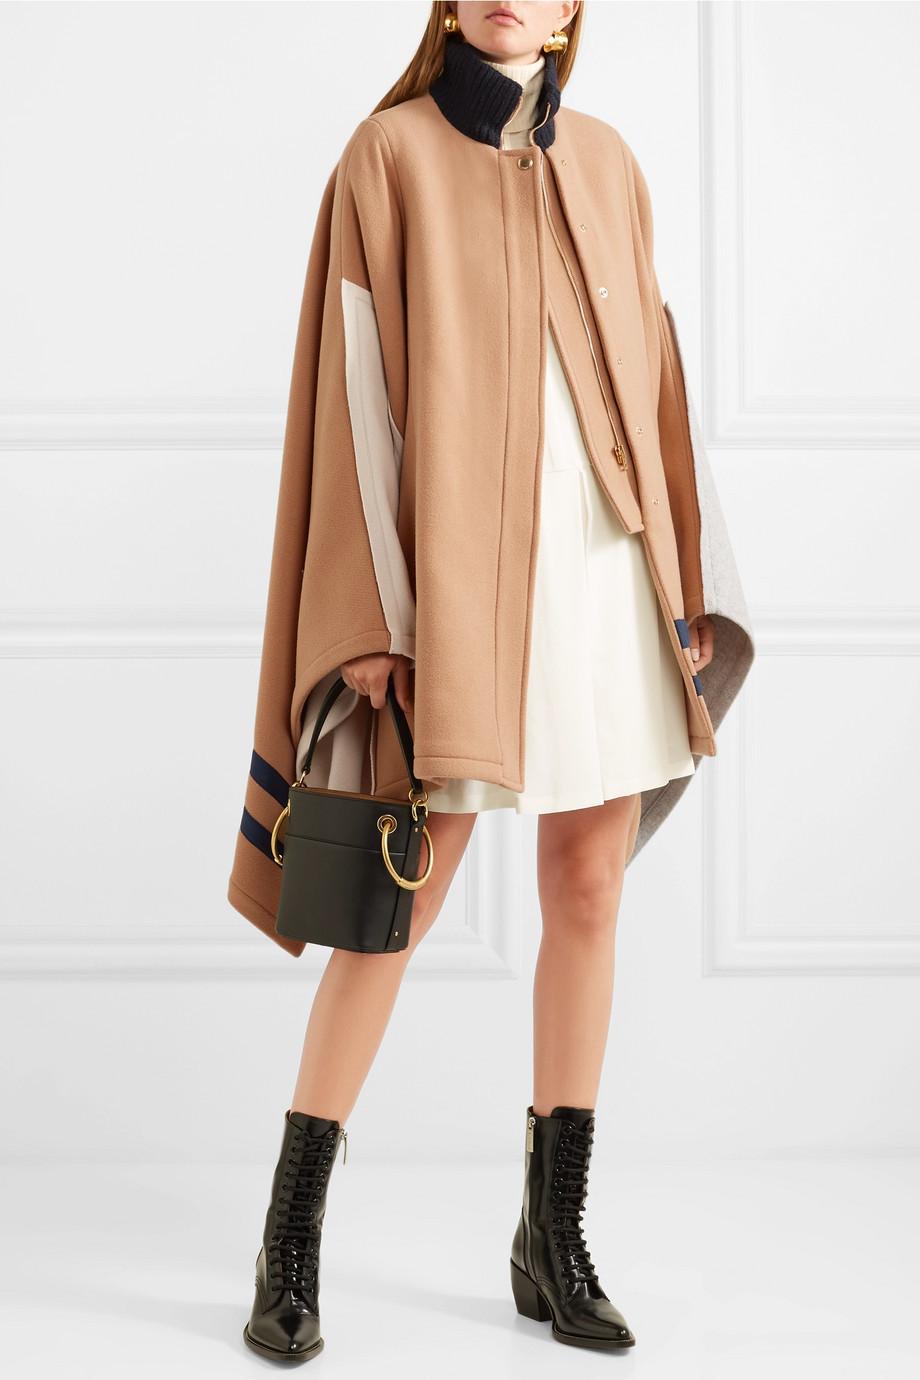 Chloe Color-block wool-blend cape $2,595